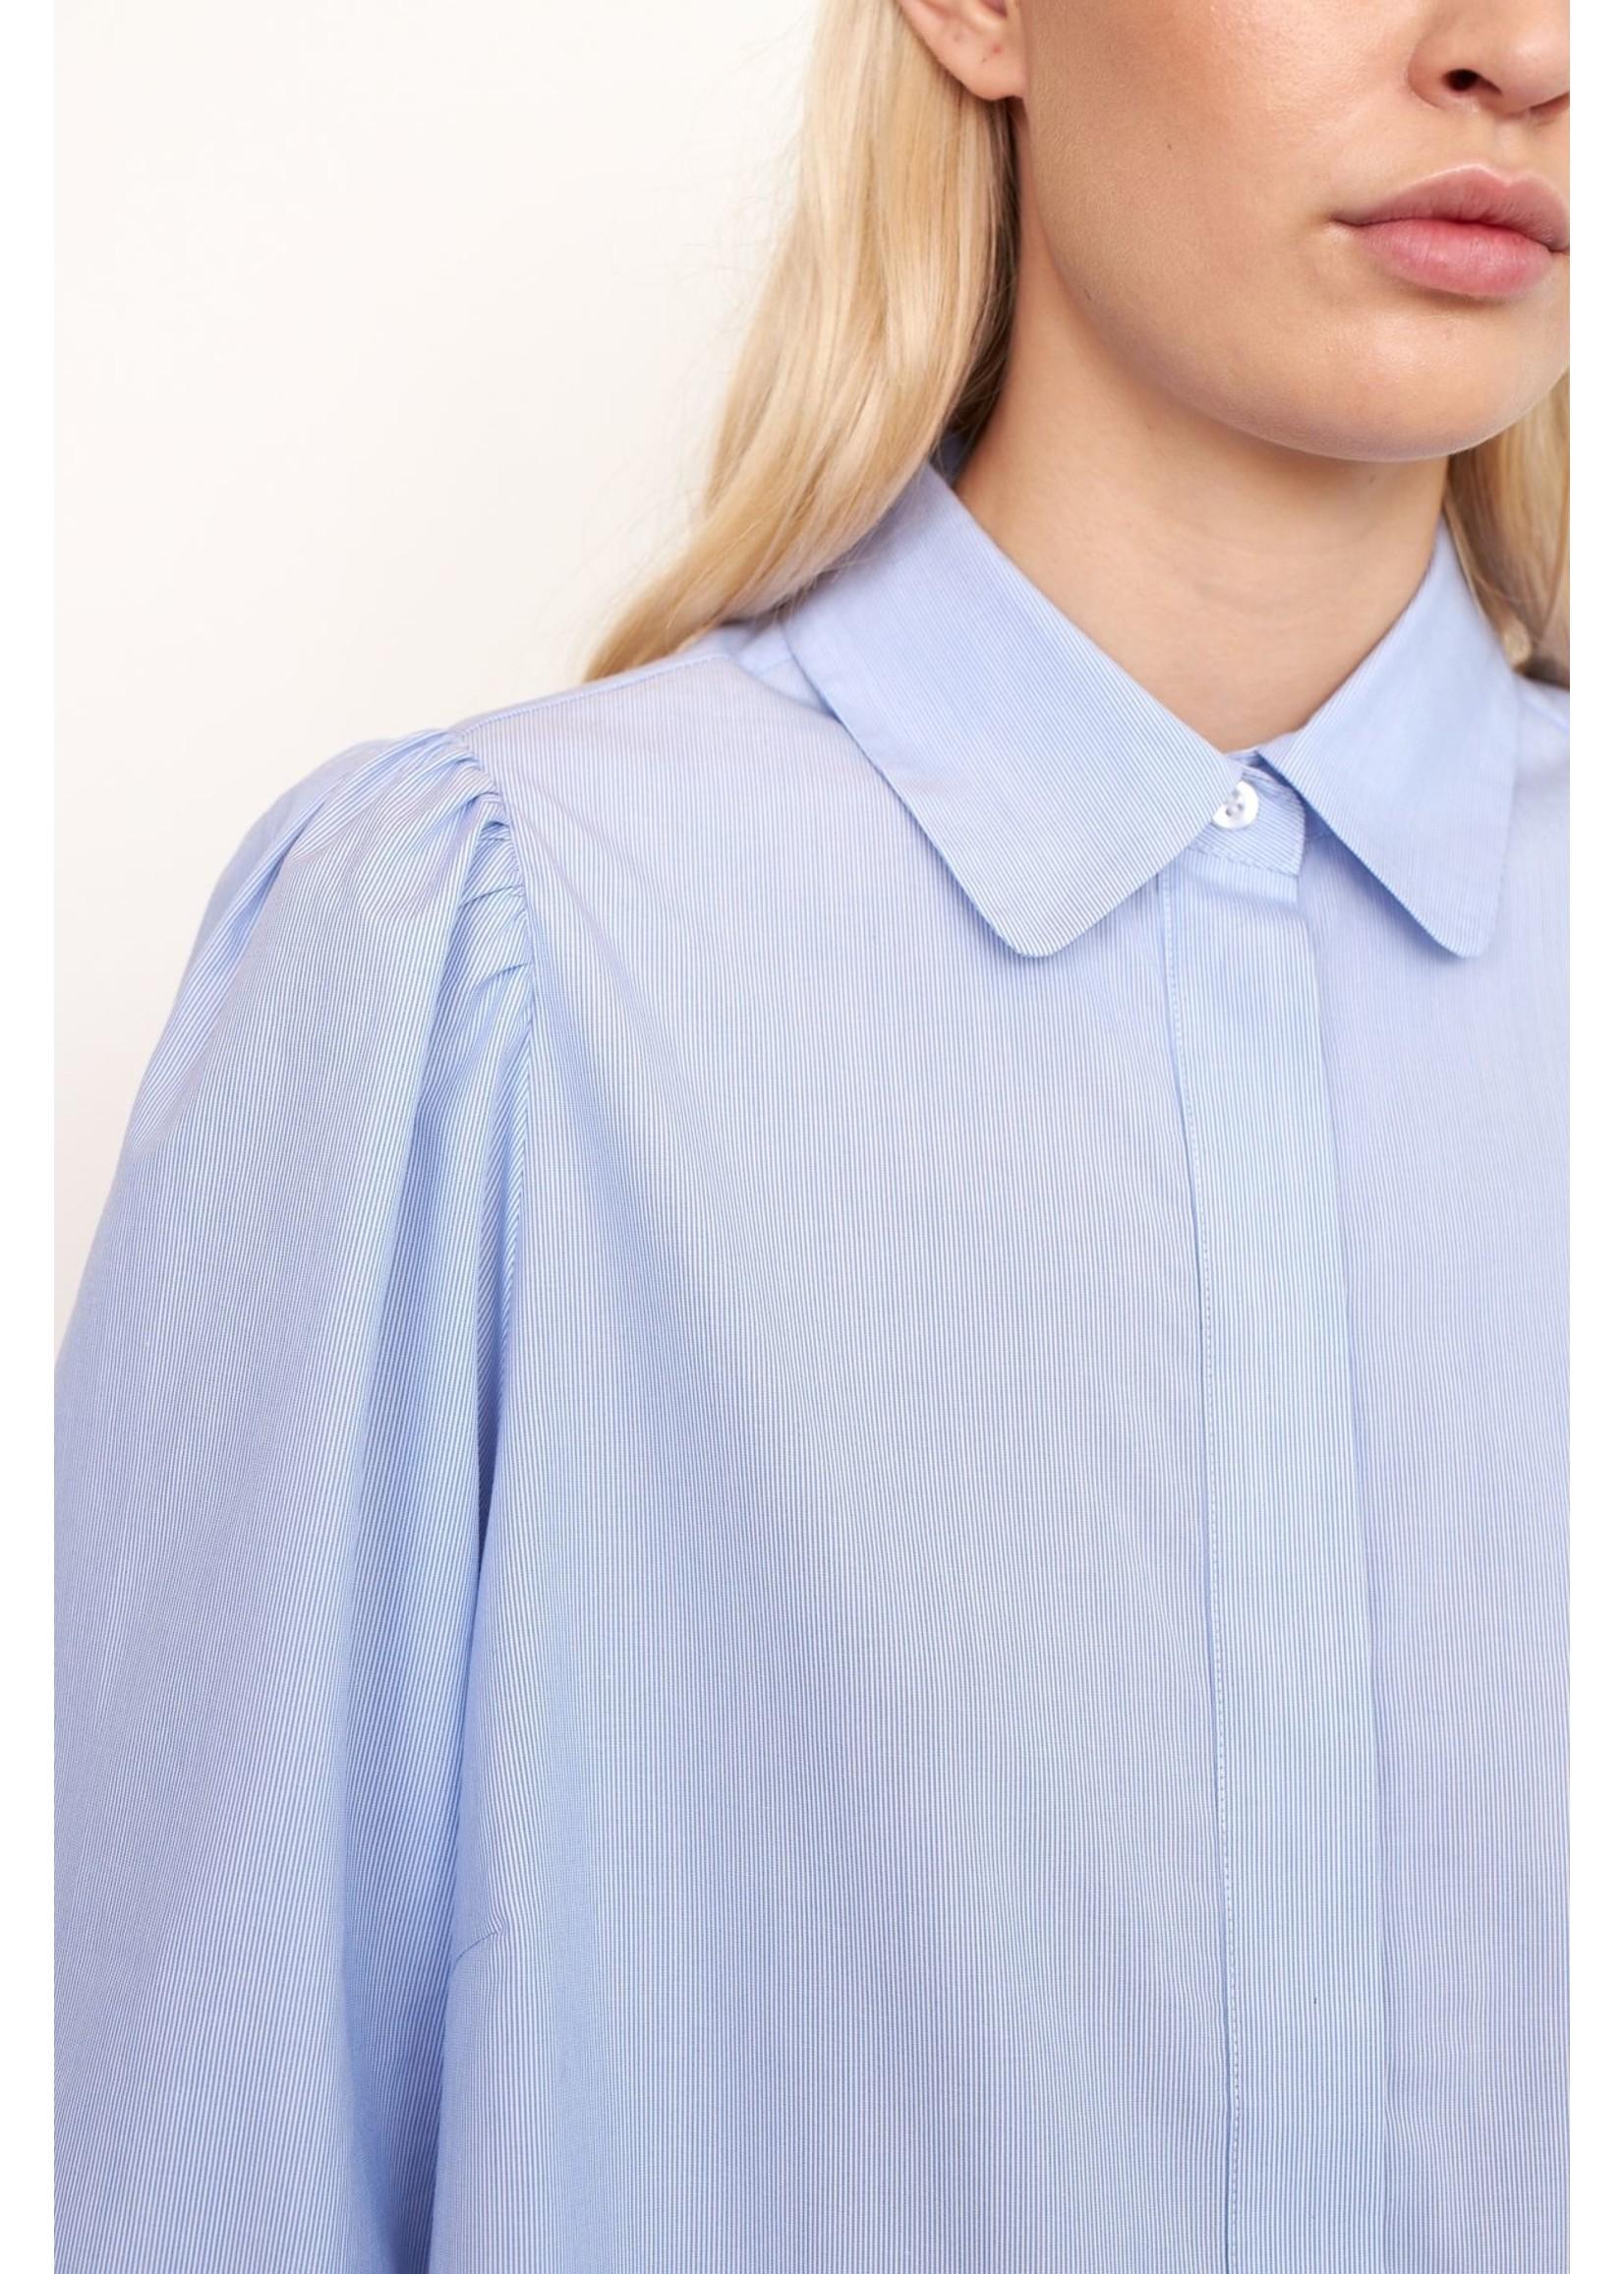 FINE STRIPED SHIRT DRESS